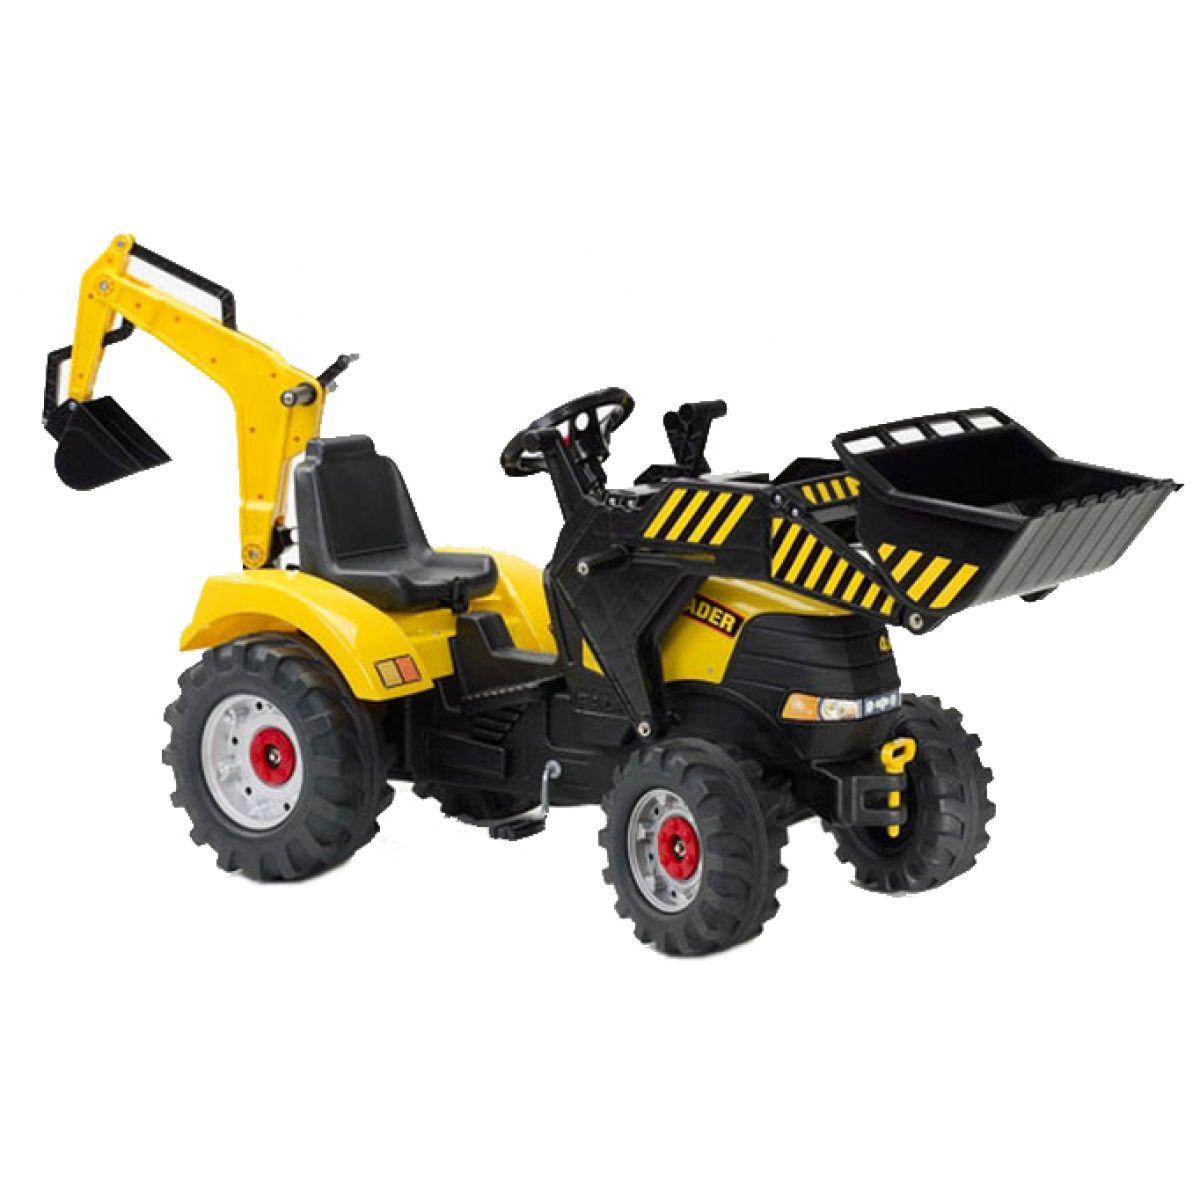 Falk Šlapací traktor žlutý s nakladačem a bagrem